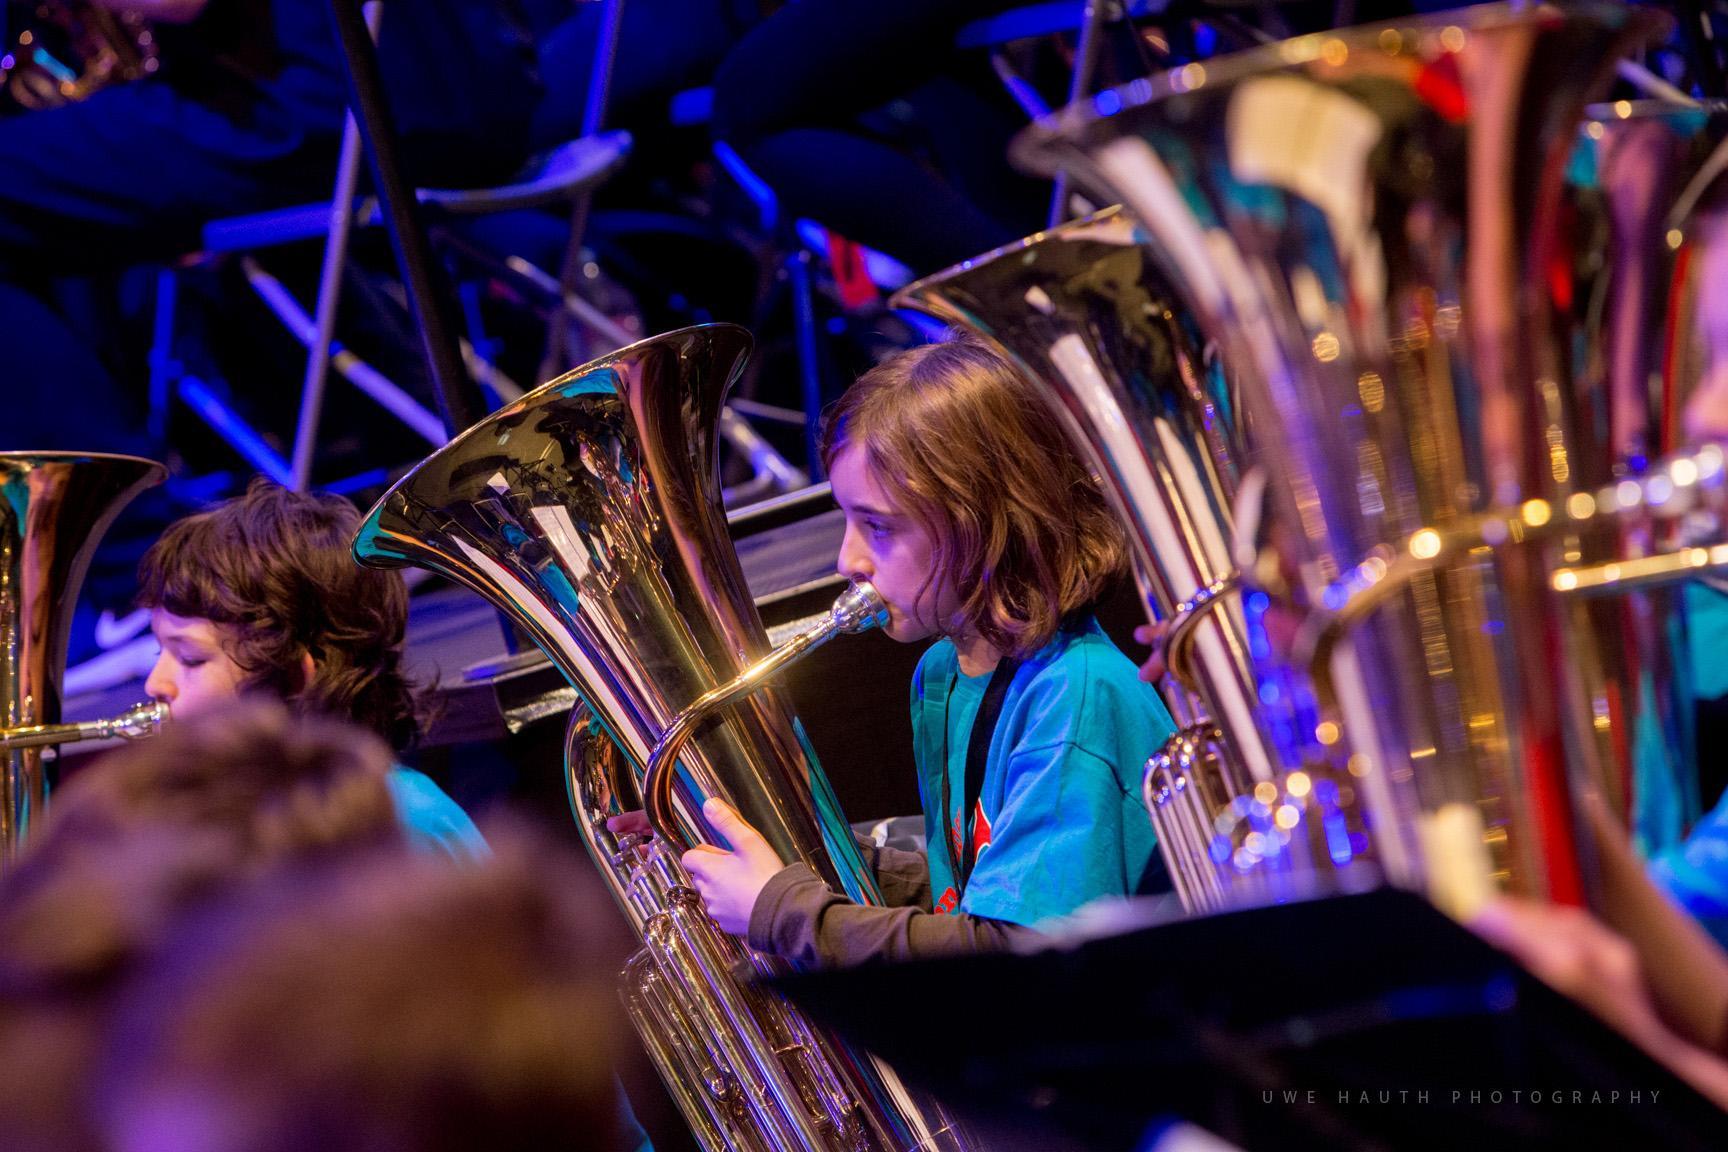 Junge Schülerin spielt Tuba